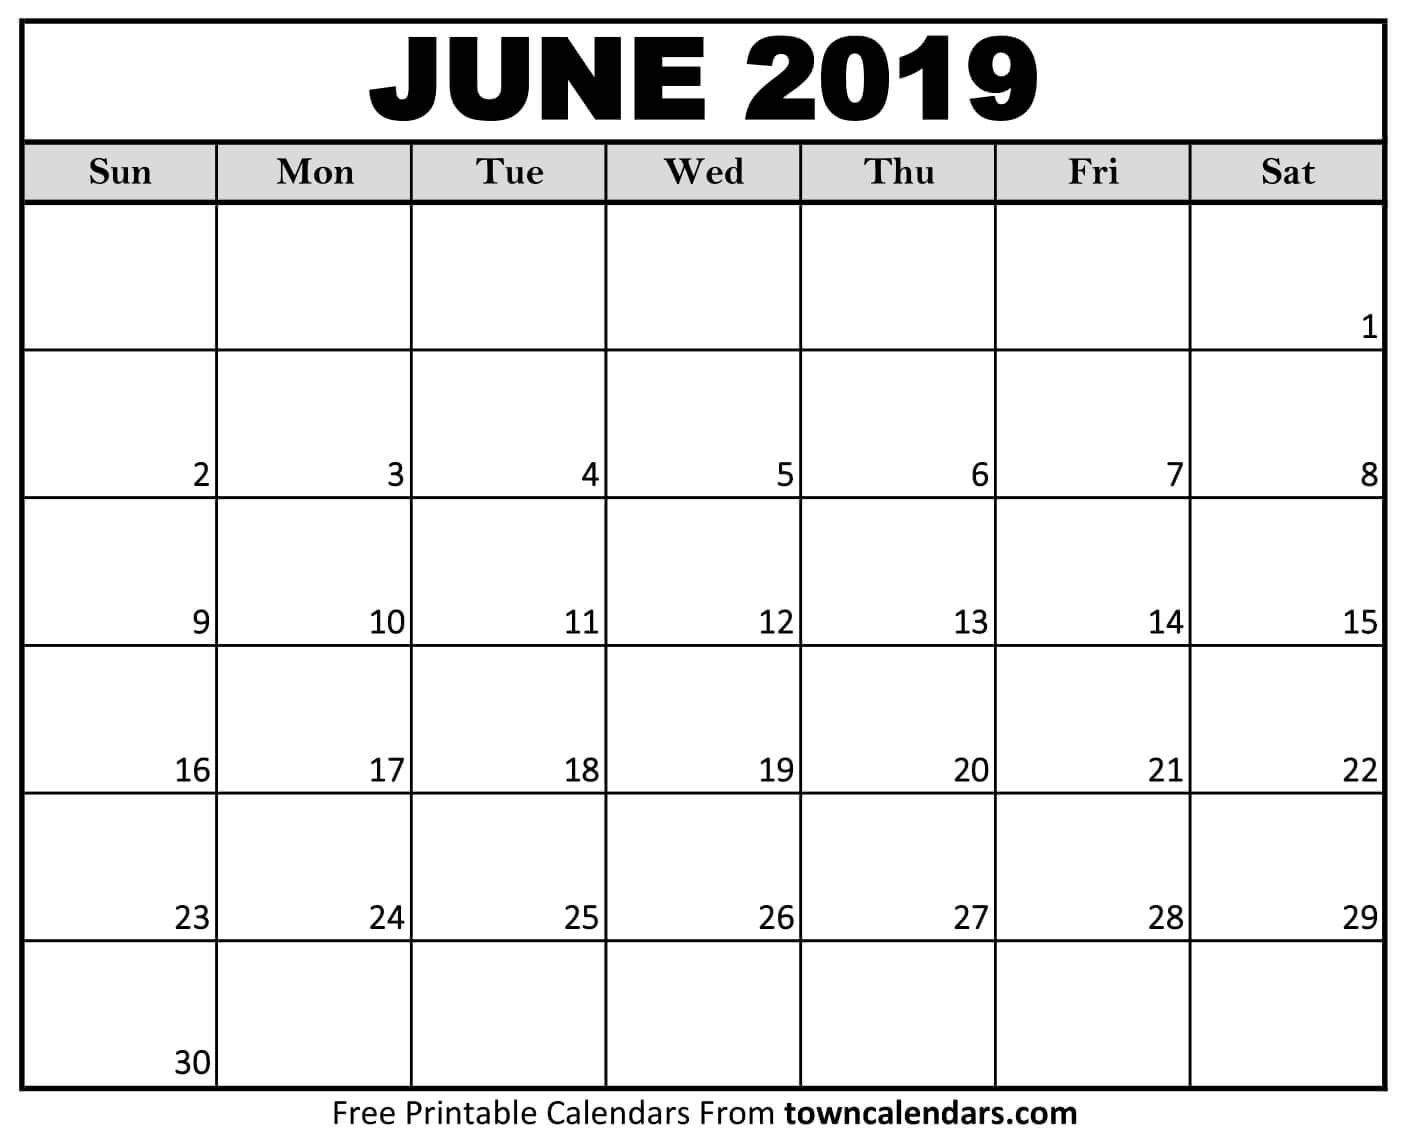 Printable June 2019 Calendar - Towncalendars June 2 2019 Calendar